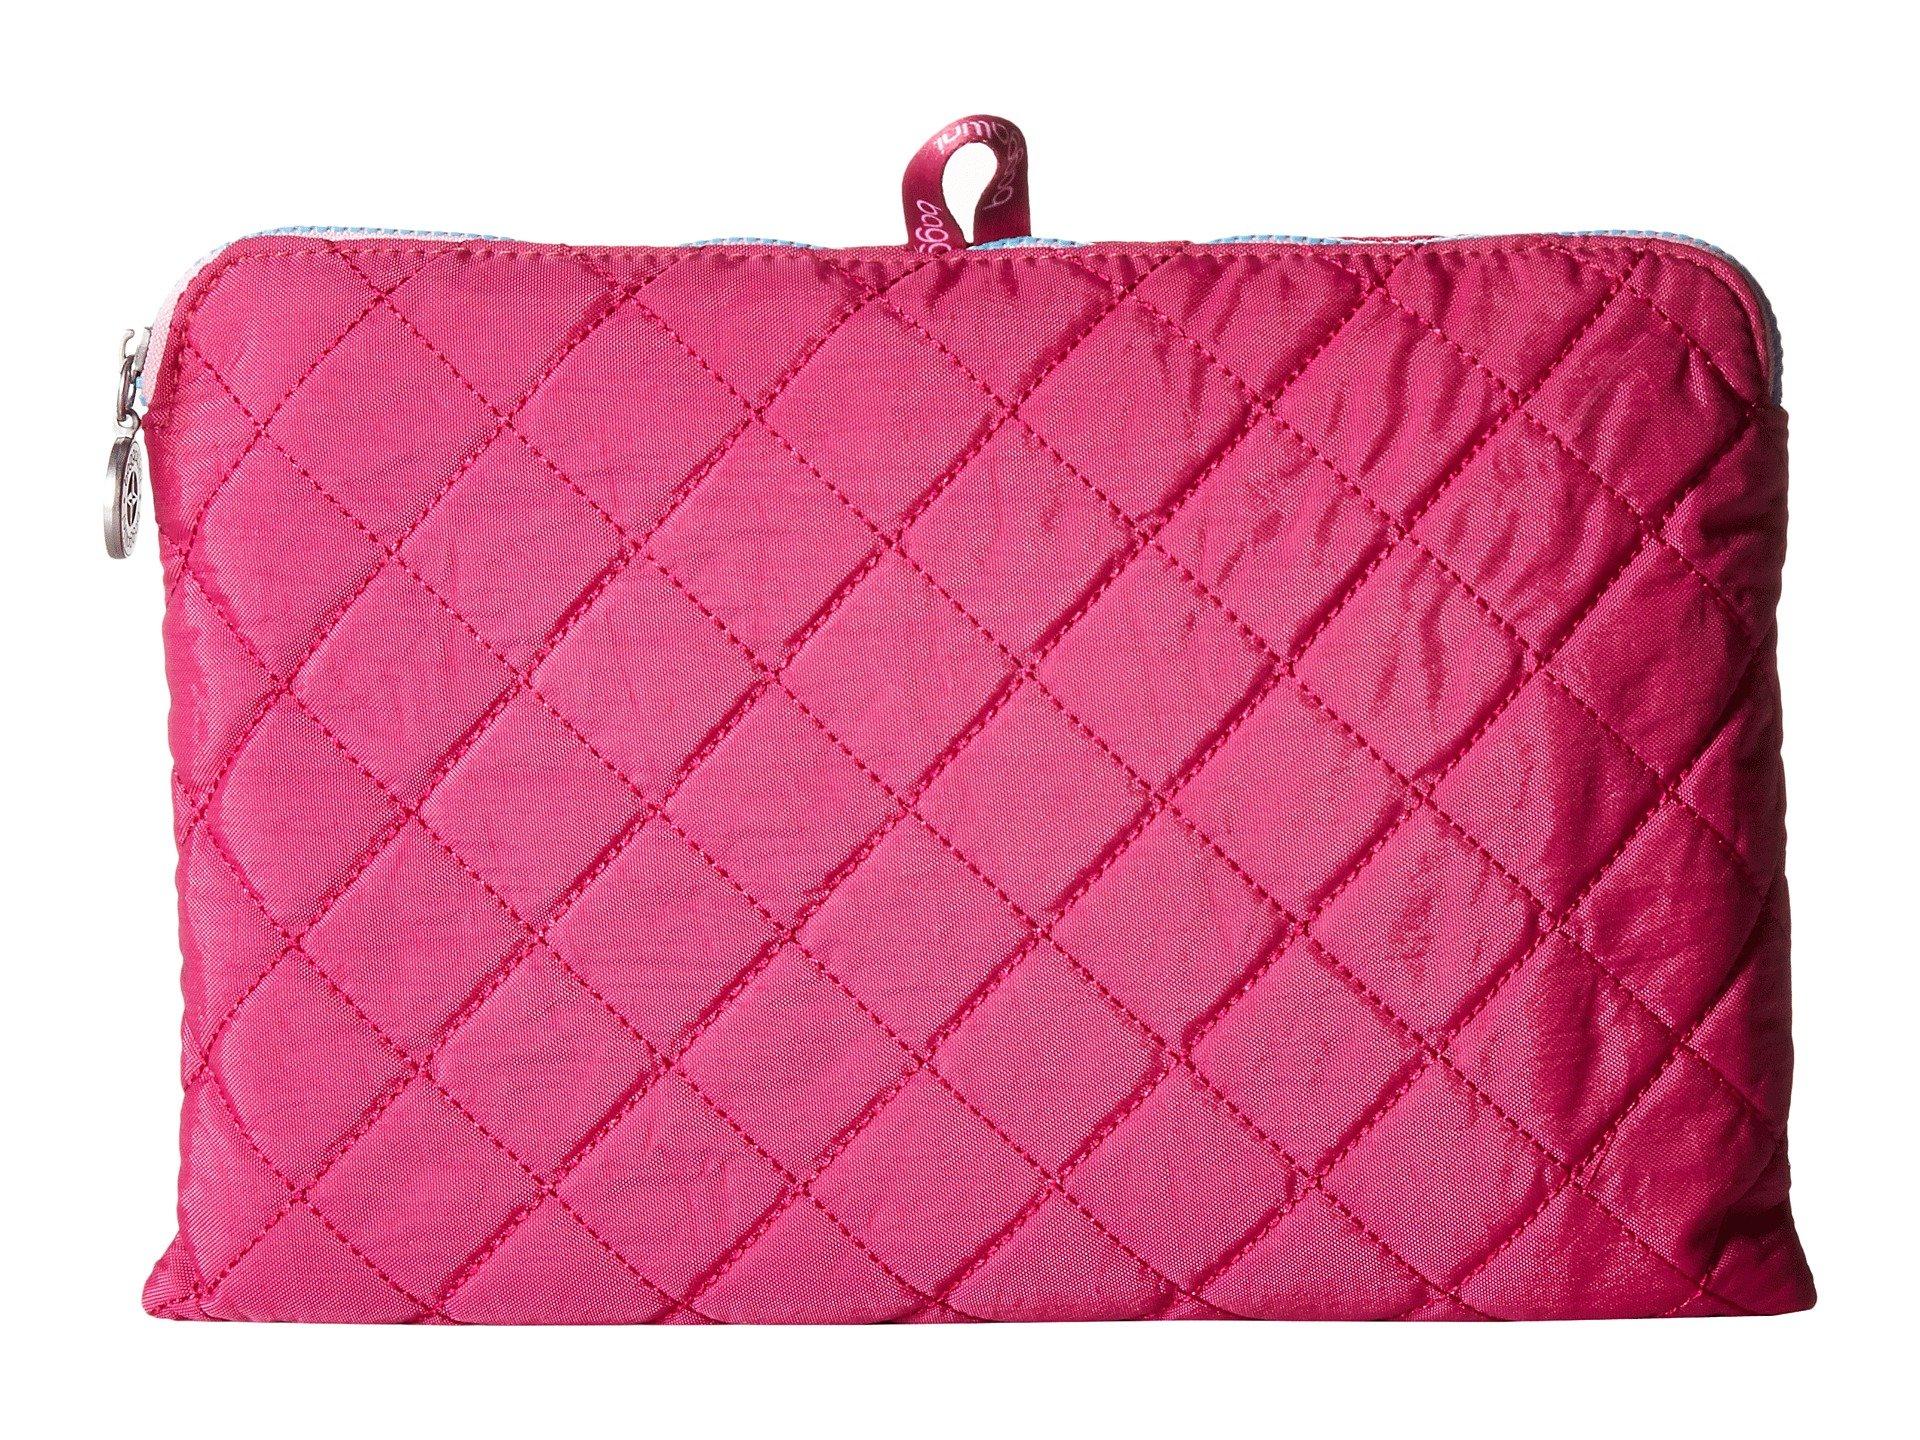 Tote pink Baggallini Classic New Foldable Fuchsia Travel wxUaIqSnU